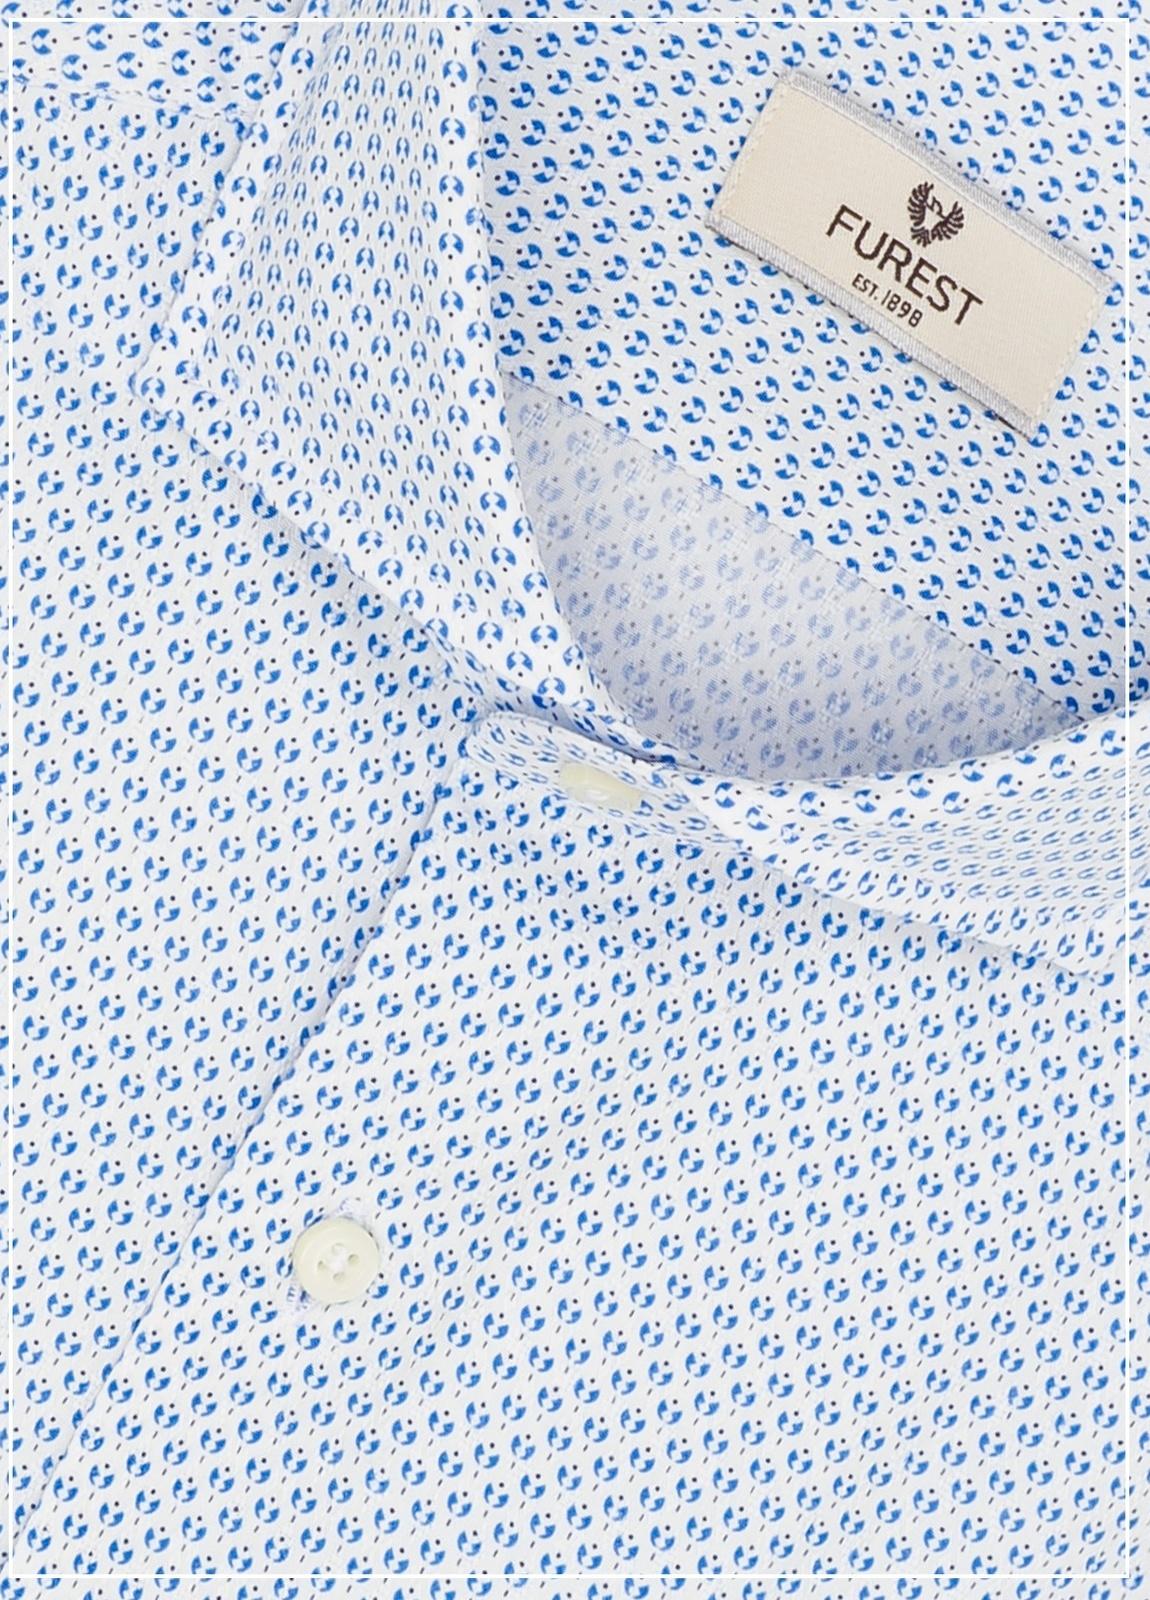 Camisa Leisure Wear SLIM FIT Modelo CAPRI diseño dibijo geométrico color celeste,100% Algodón. - Ítem1